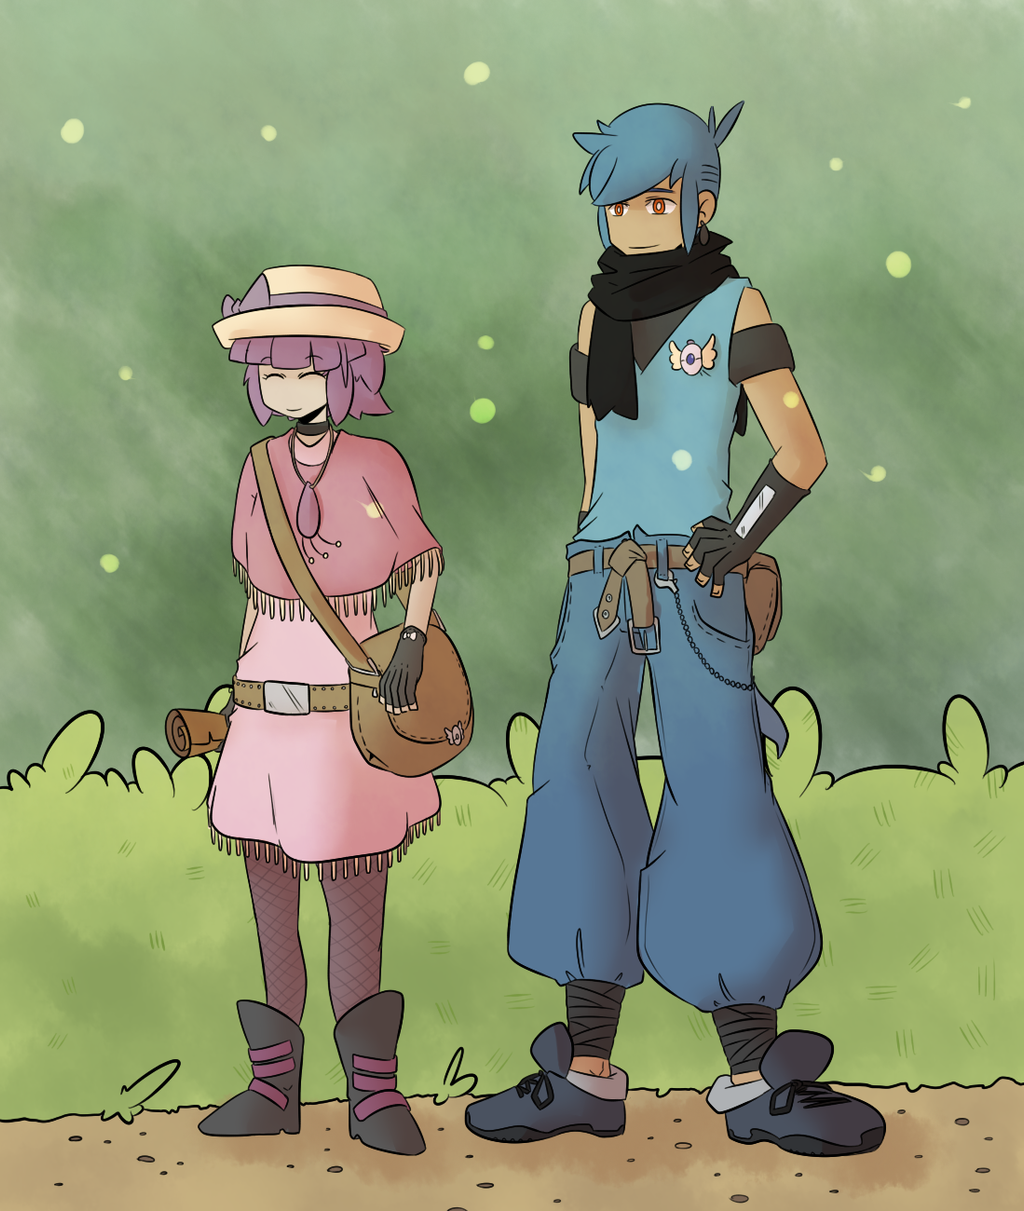 Explorers of Sky: Kaoru and Momo by kuromizuouji